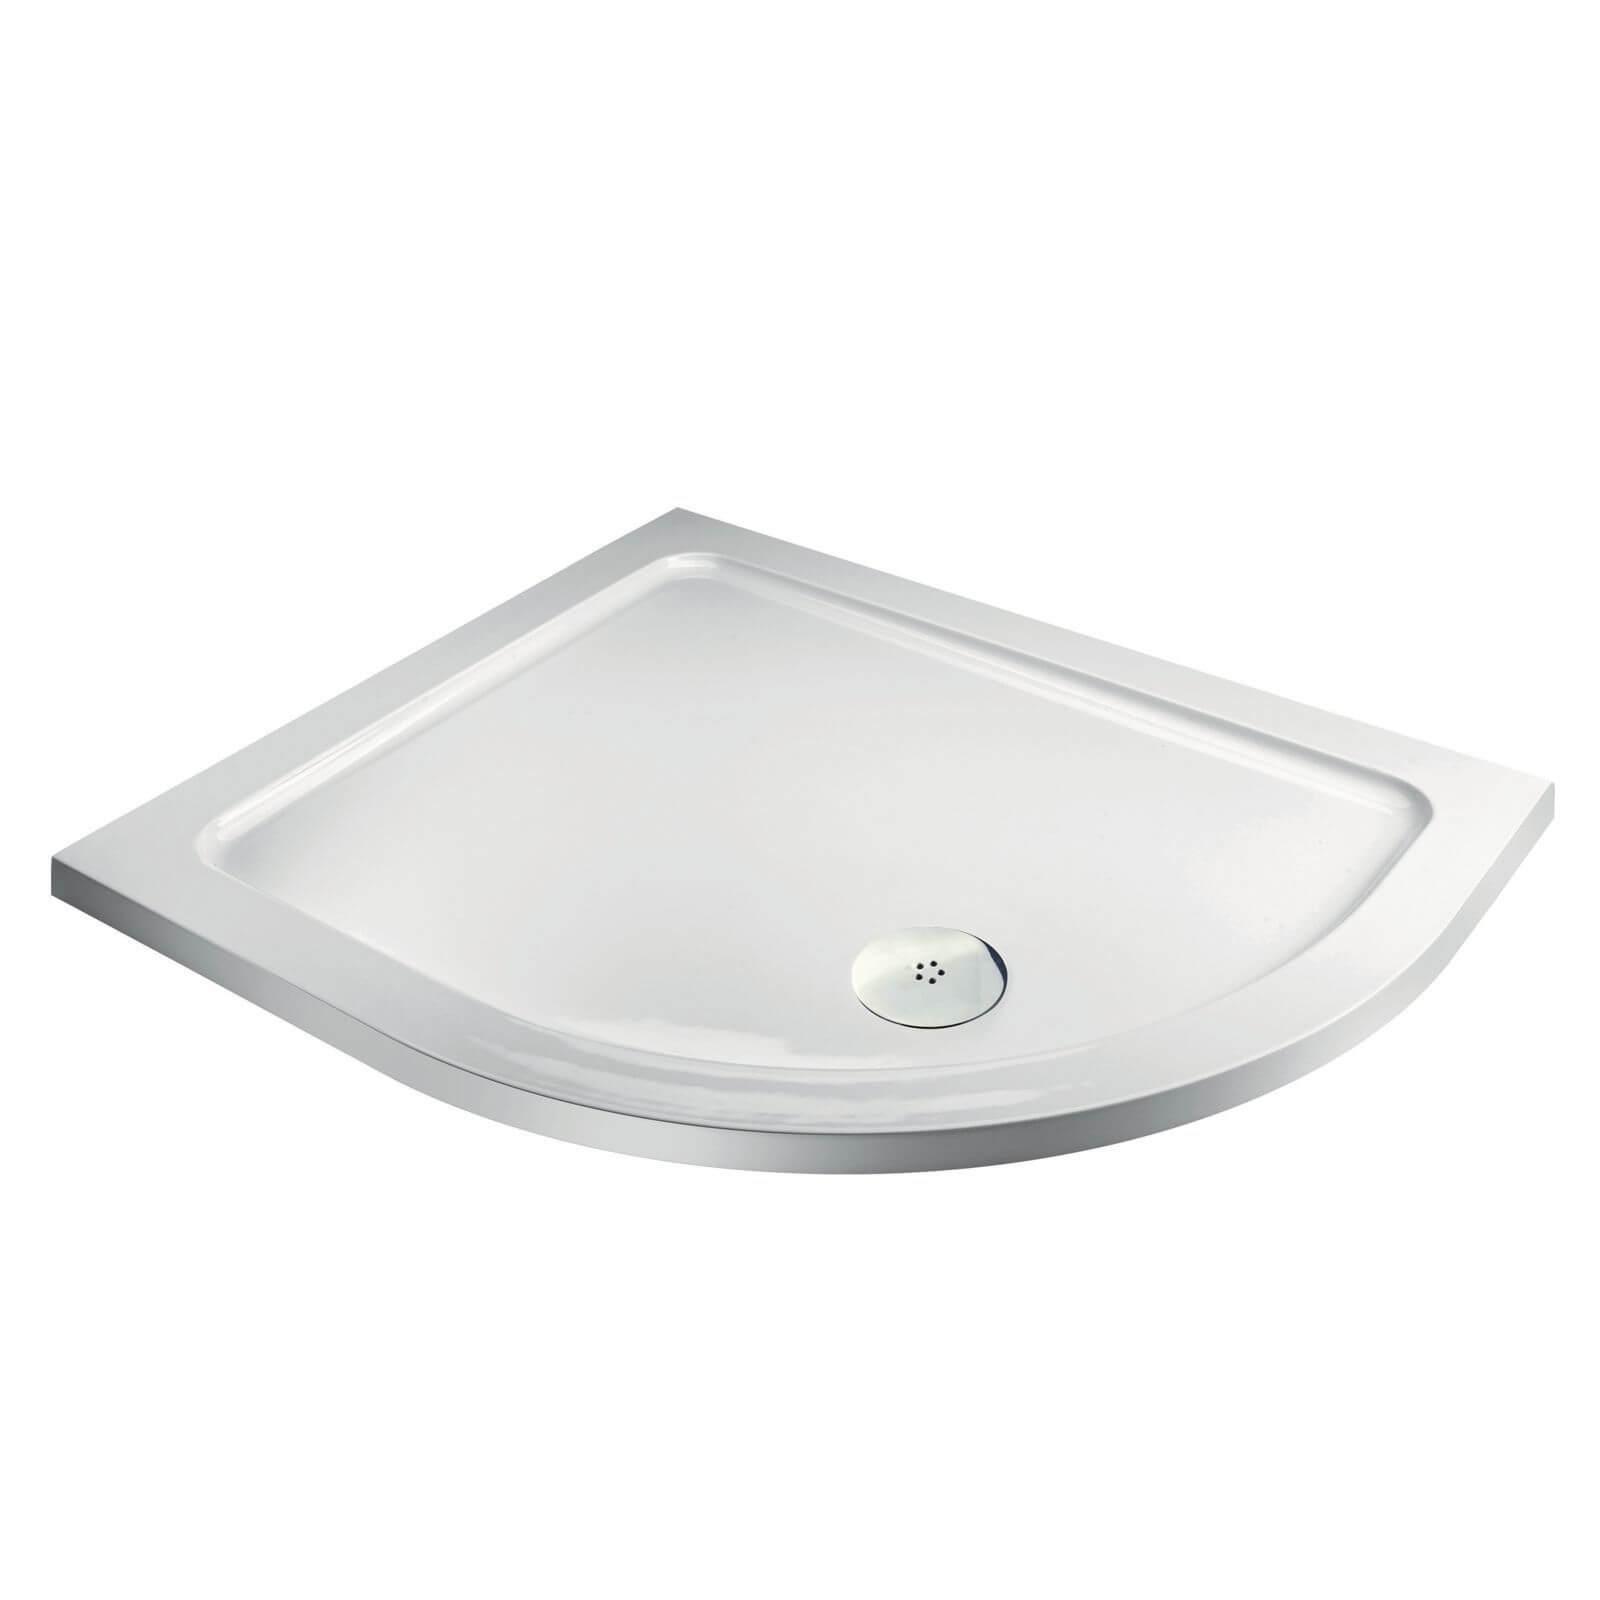 Aqualux Offset Quadrant RH Shower Tray - 1200 x 900 x 35mm